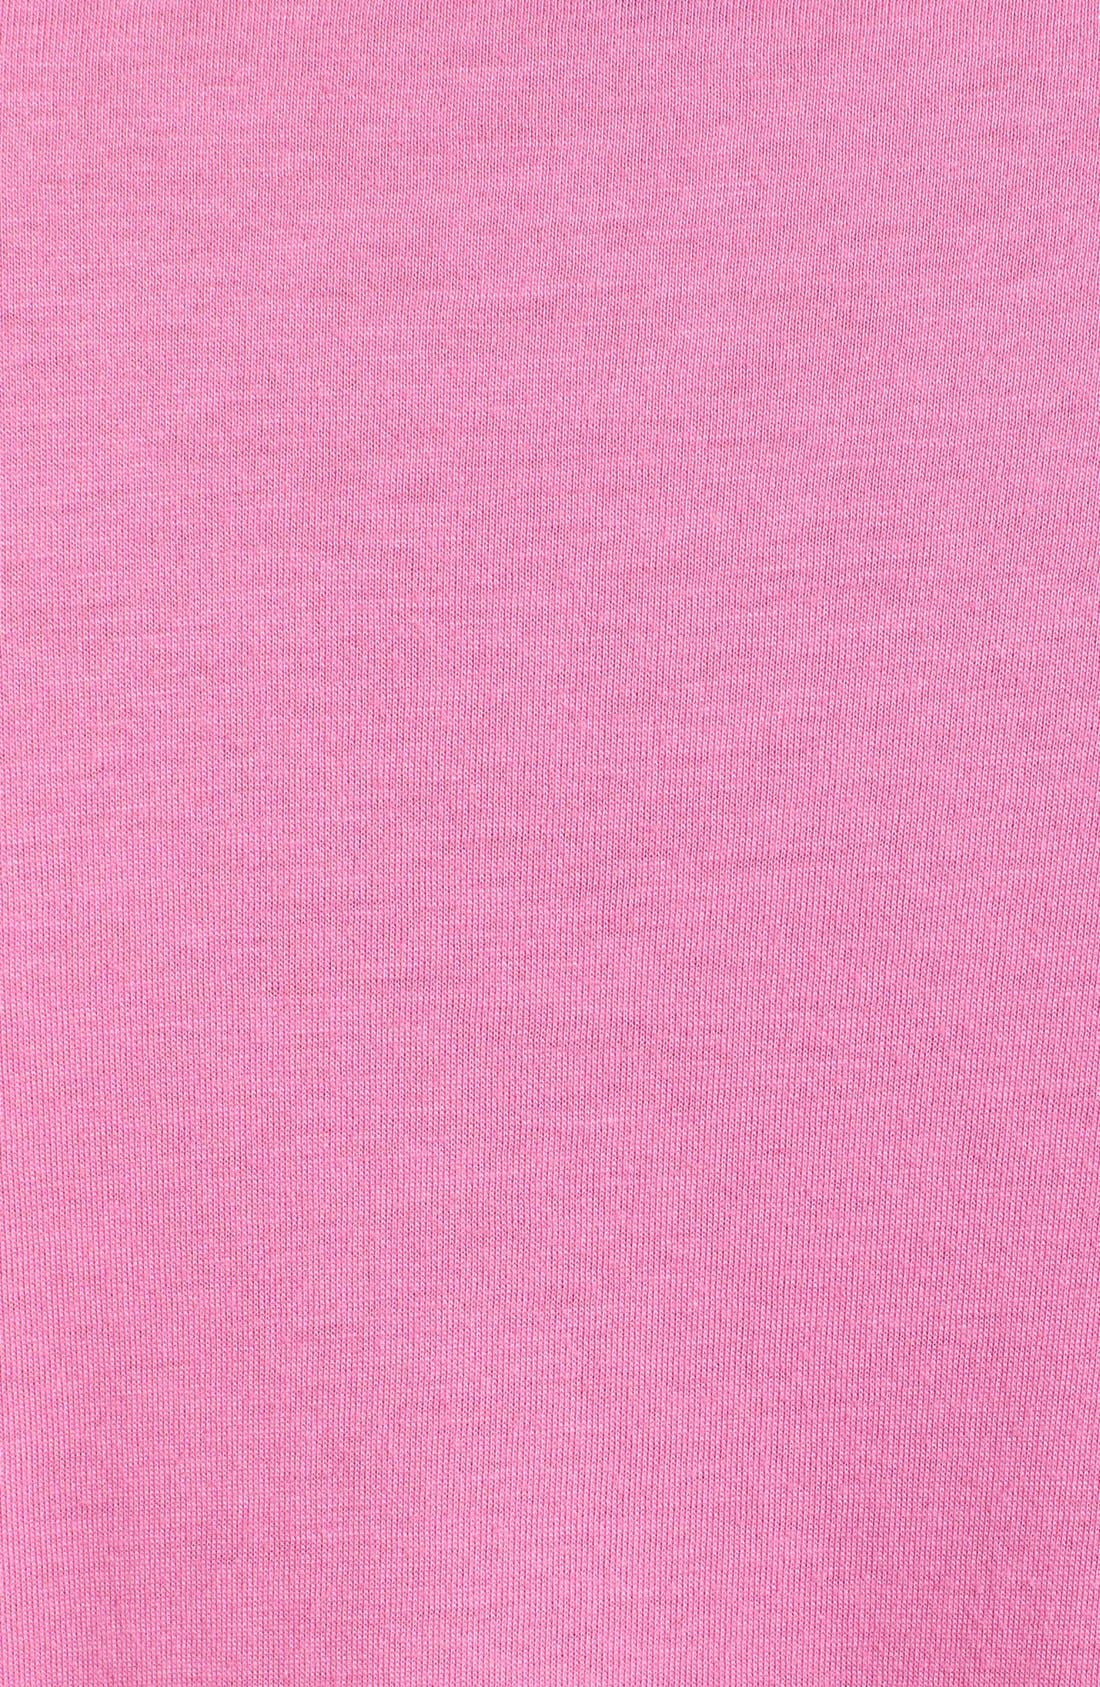 Knit Pajamas,                             Alternate thumbnail 3, color,                             678